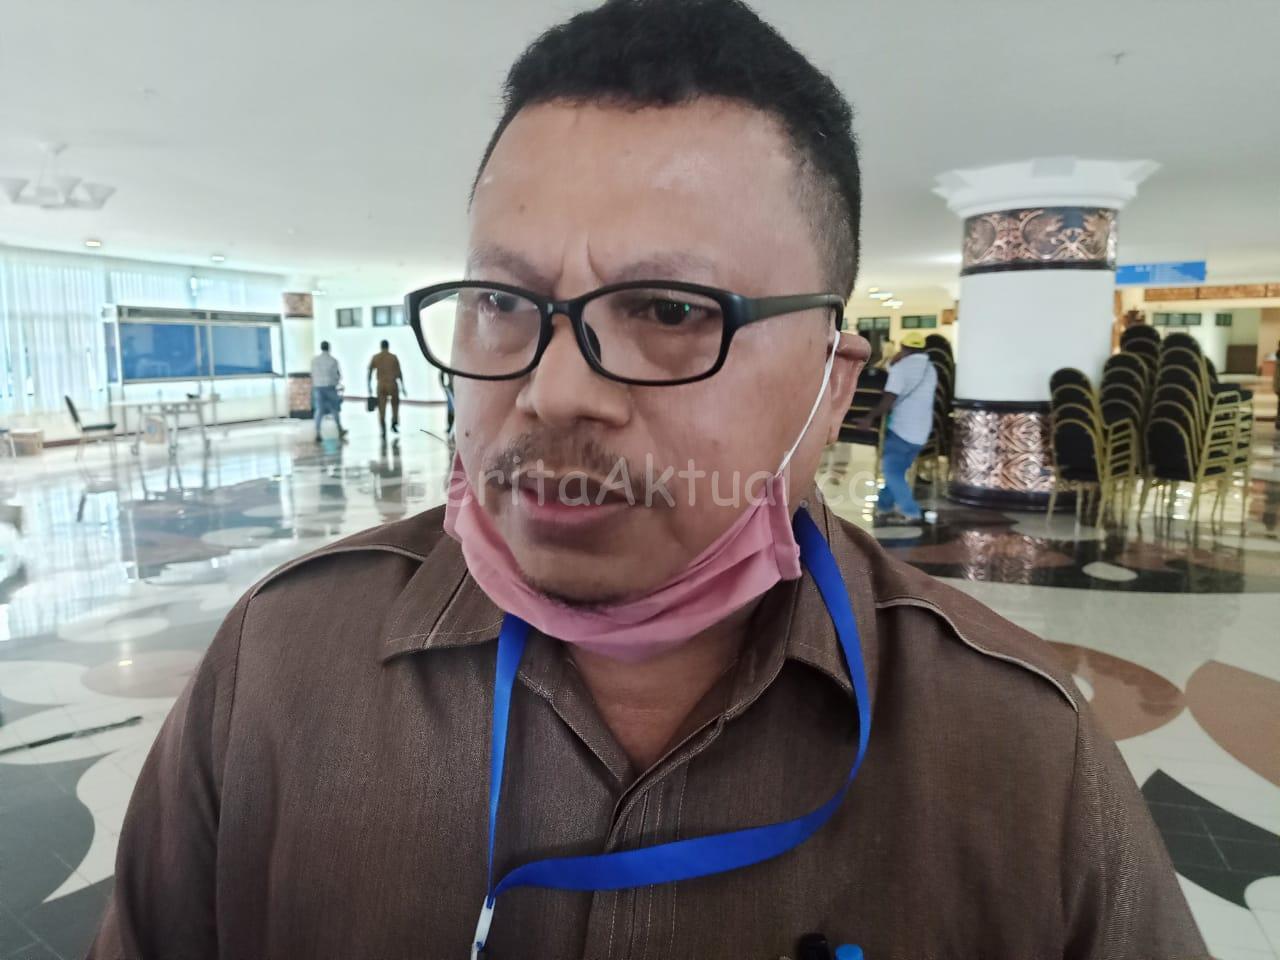 Hampir Sebulan Belum Ada Yang Klaim Sebagai Pencipta Lagu Tanah Papua 26 IMG 20200610 WA0023